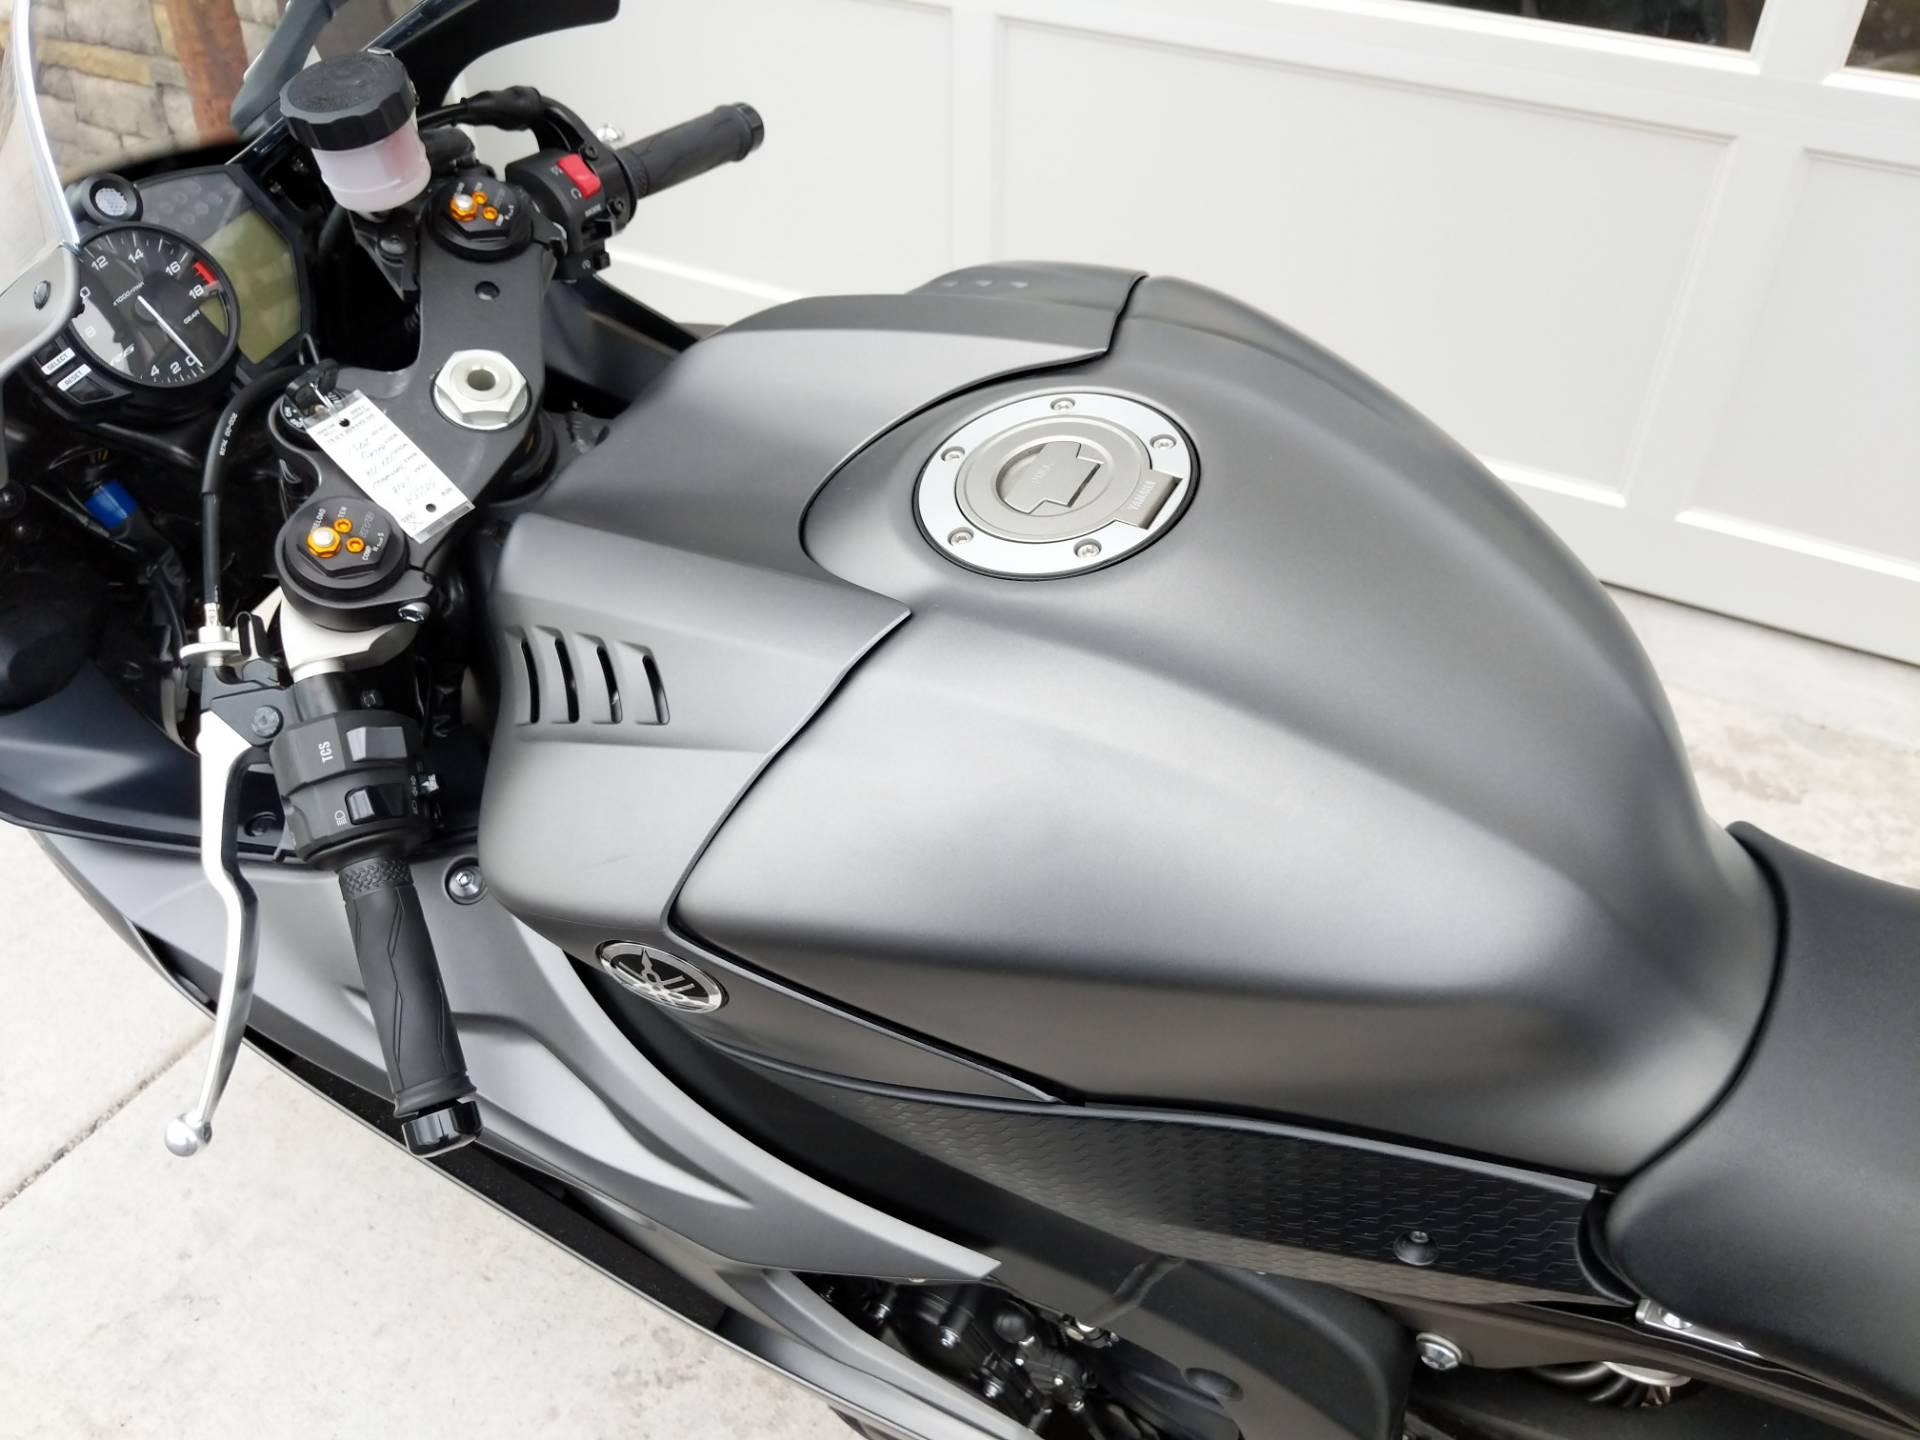 2018 Yamaha YZF-R6 12